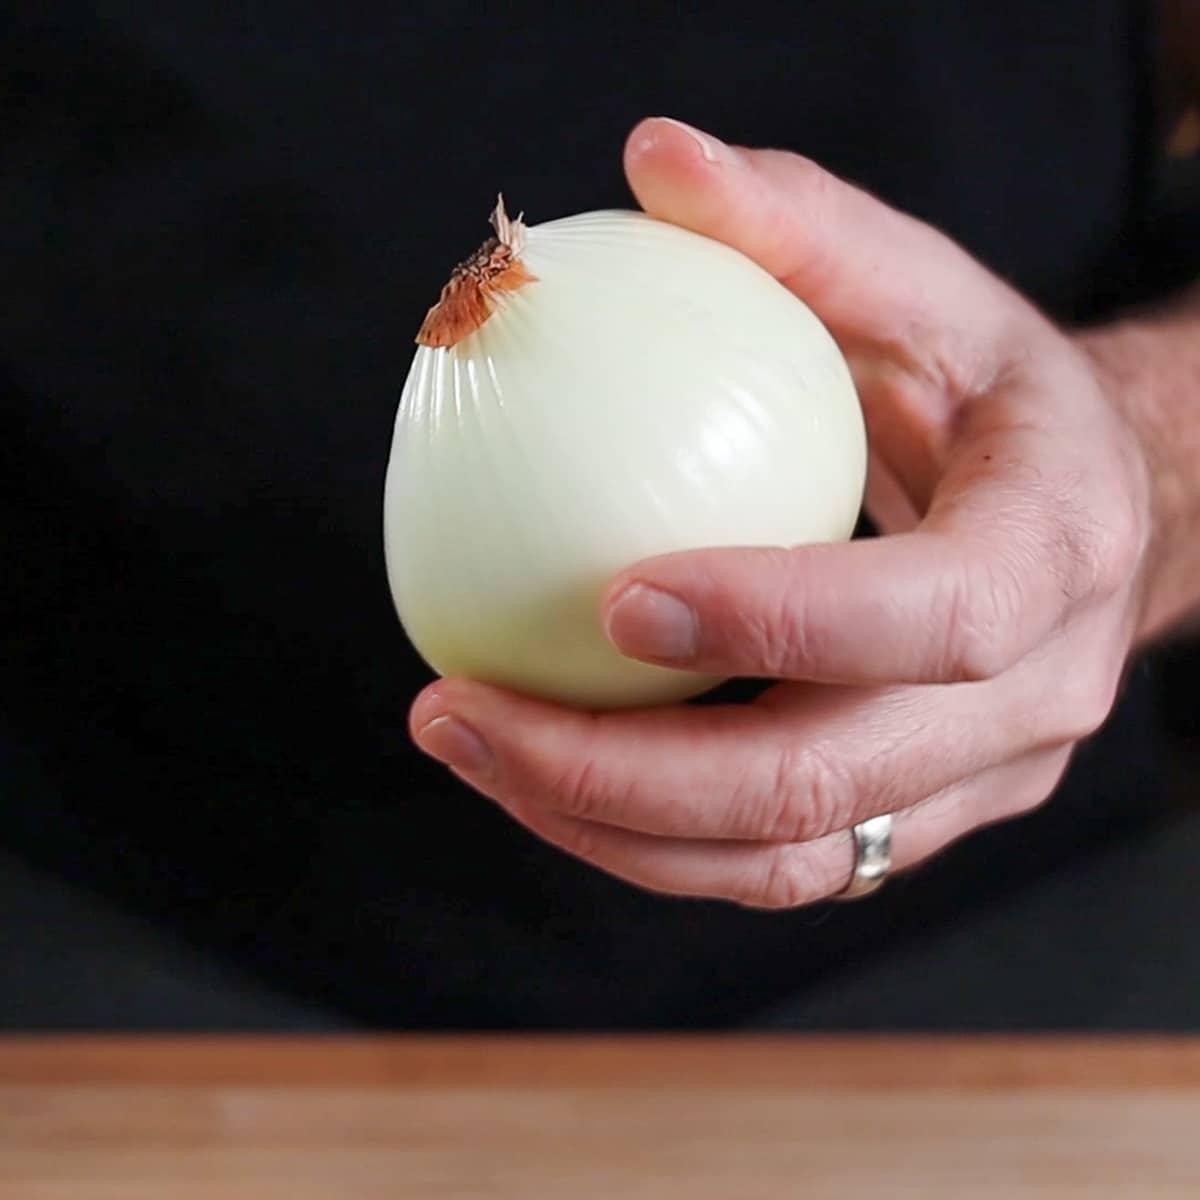 how to peel an onion